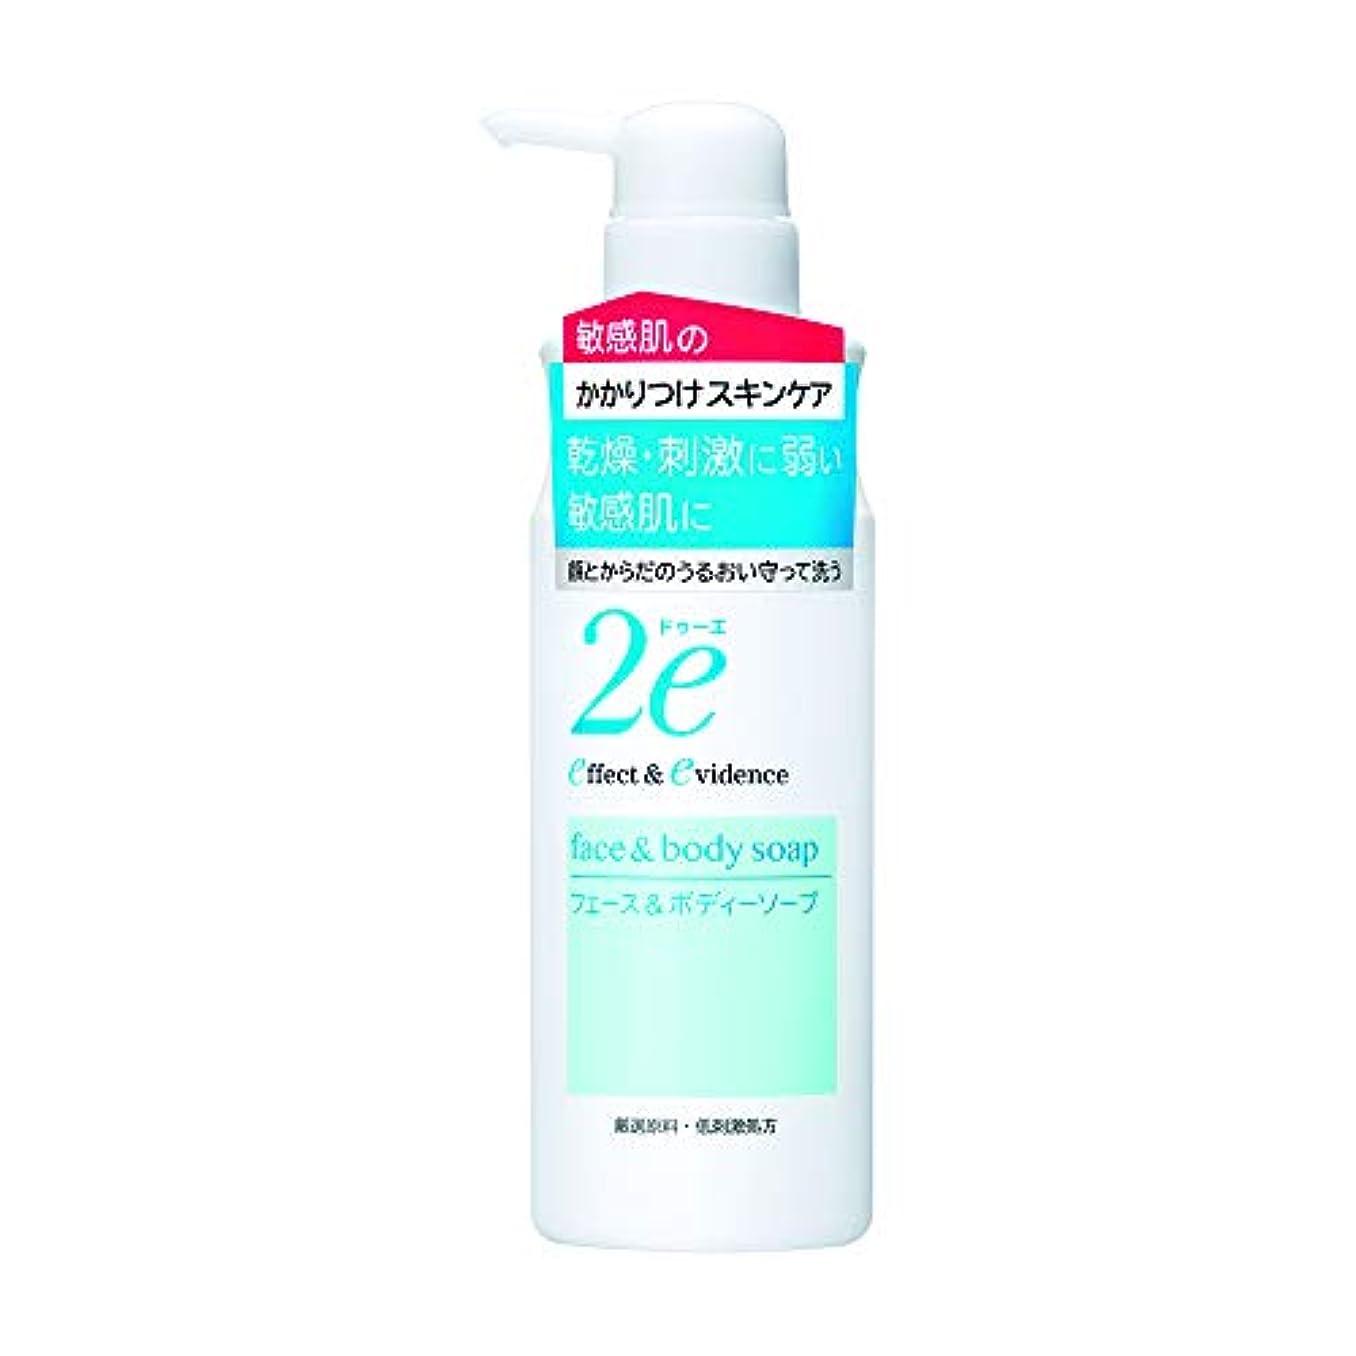 2e(ドゥーエ) フェース&ボディーソープ 敏感肌用洗浄料 低刺激処方 420ml ボディソープ